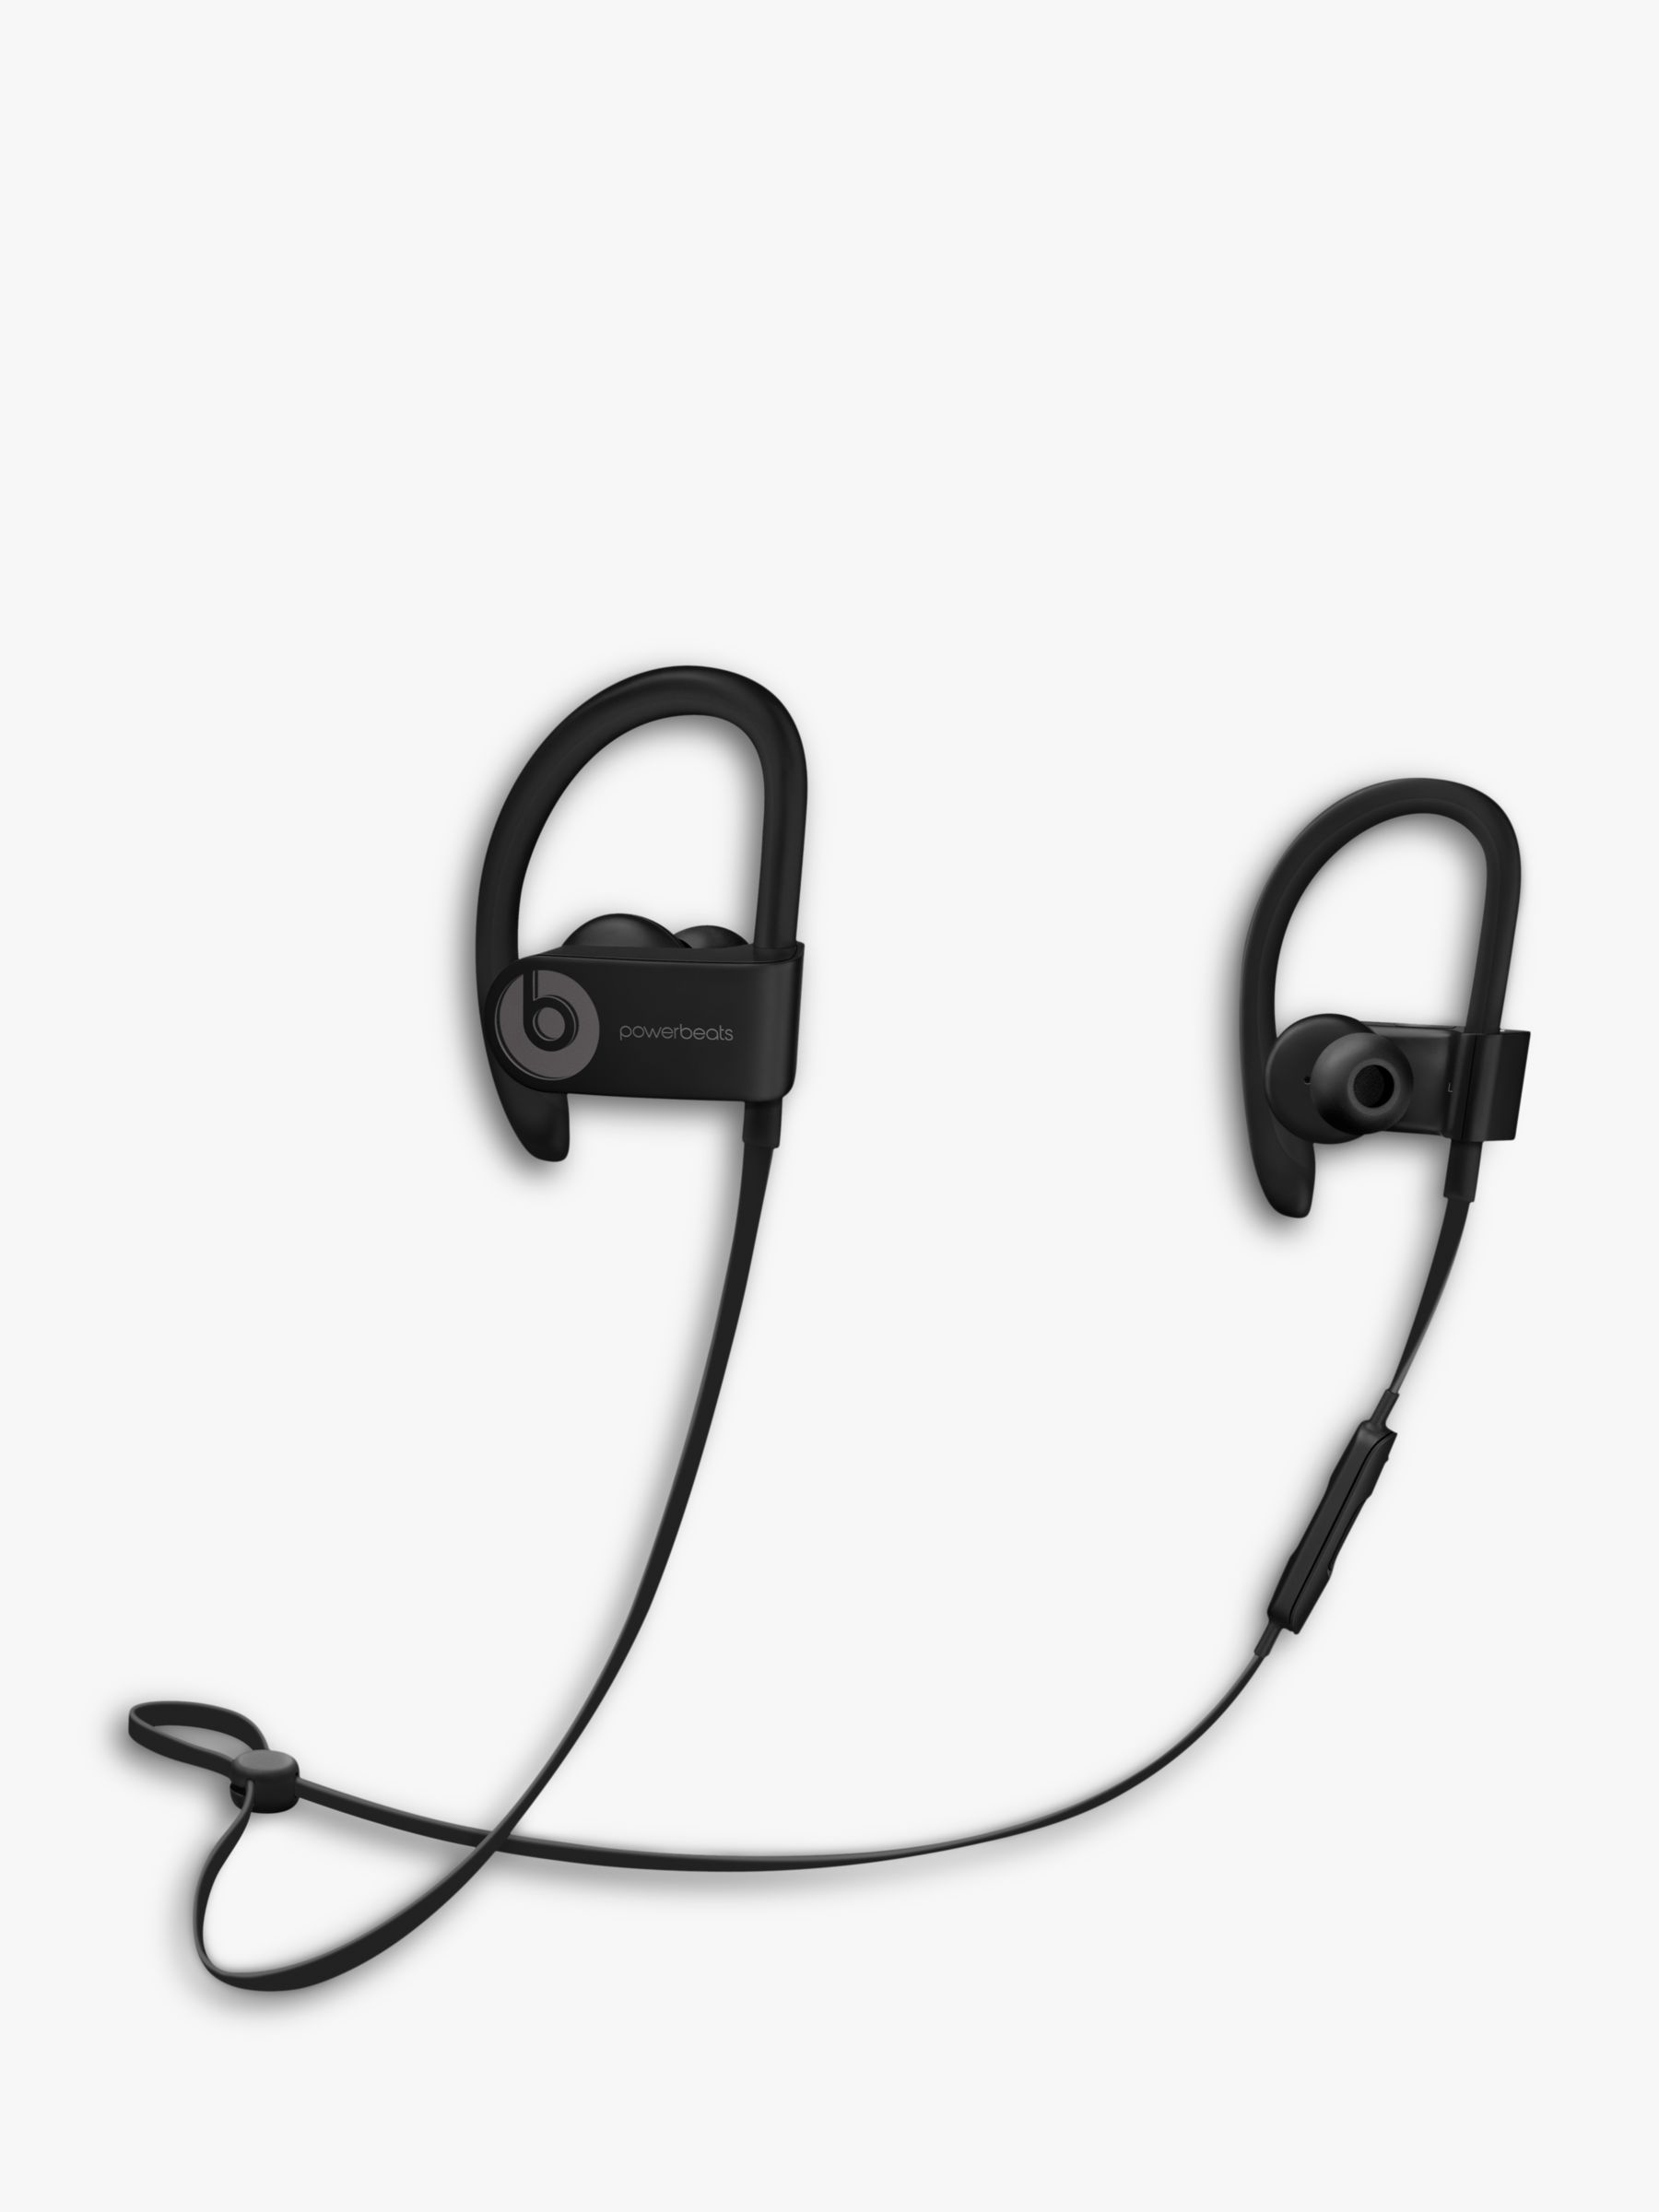 Beats PowerBeats 3 by Dr. Dre™ Wireless In-Ear Sport Headphones with Mic/Remote